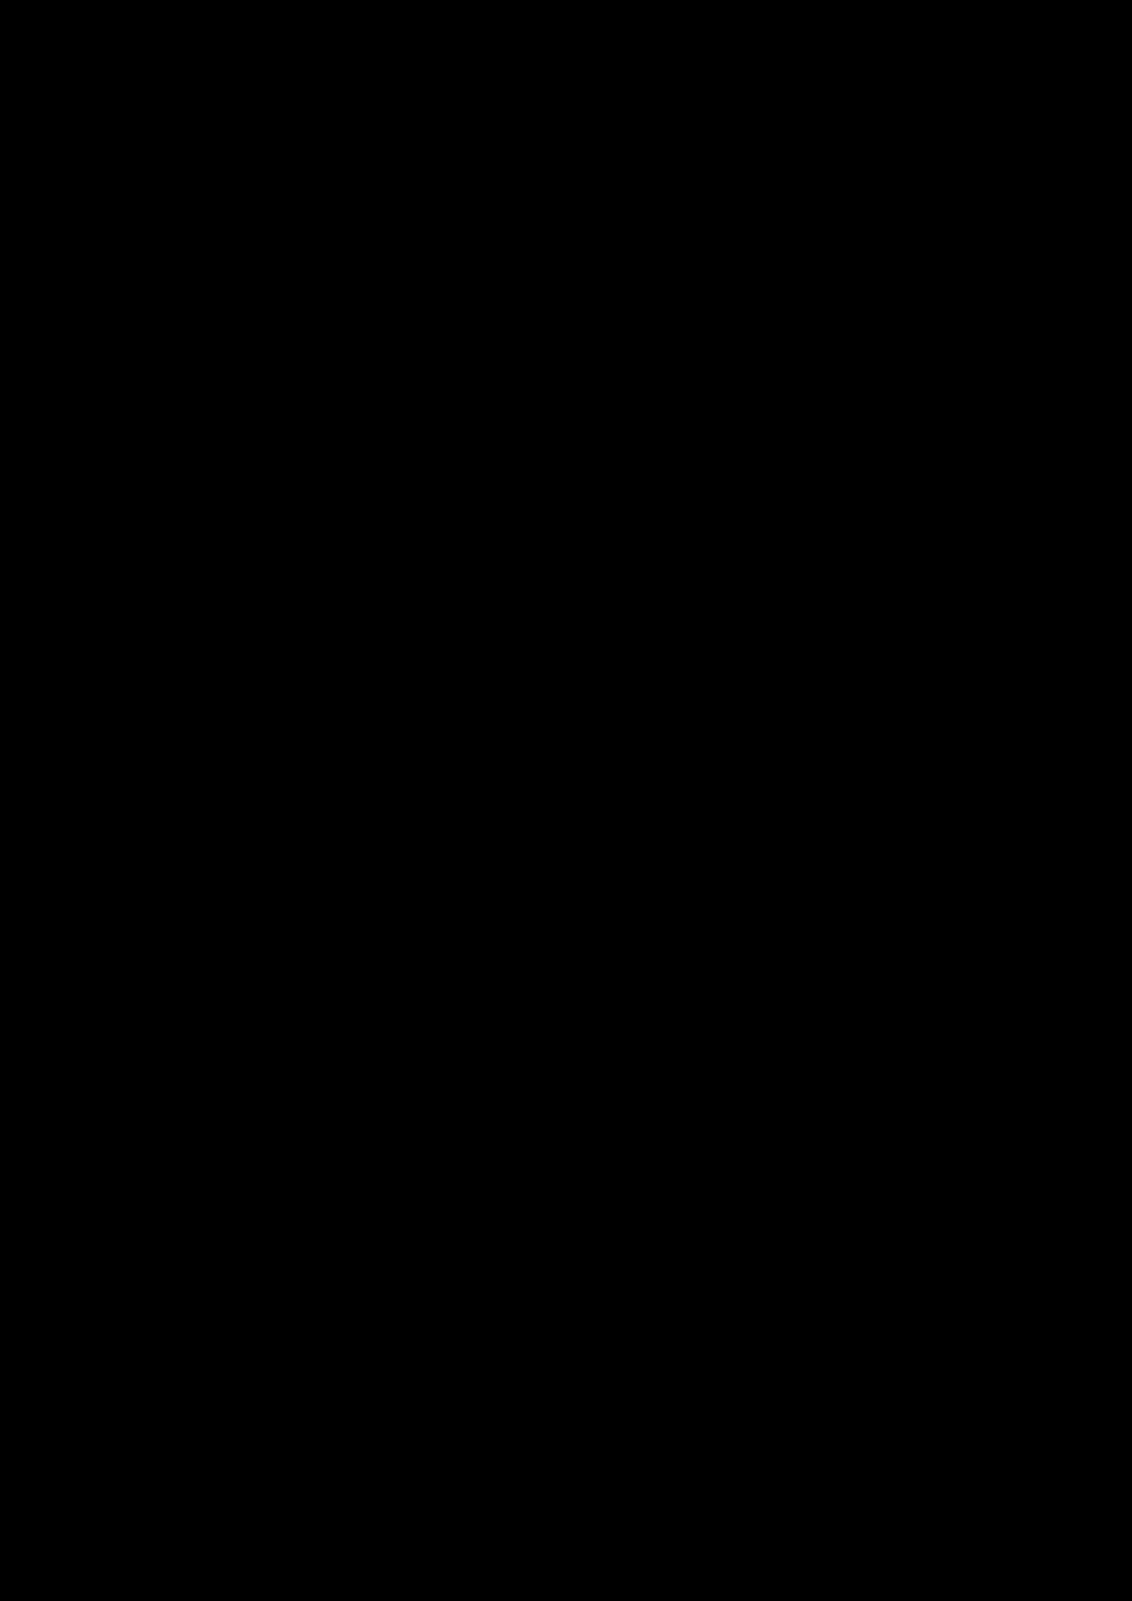 Belyiy sokol slide, Image 204